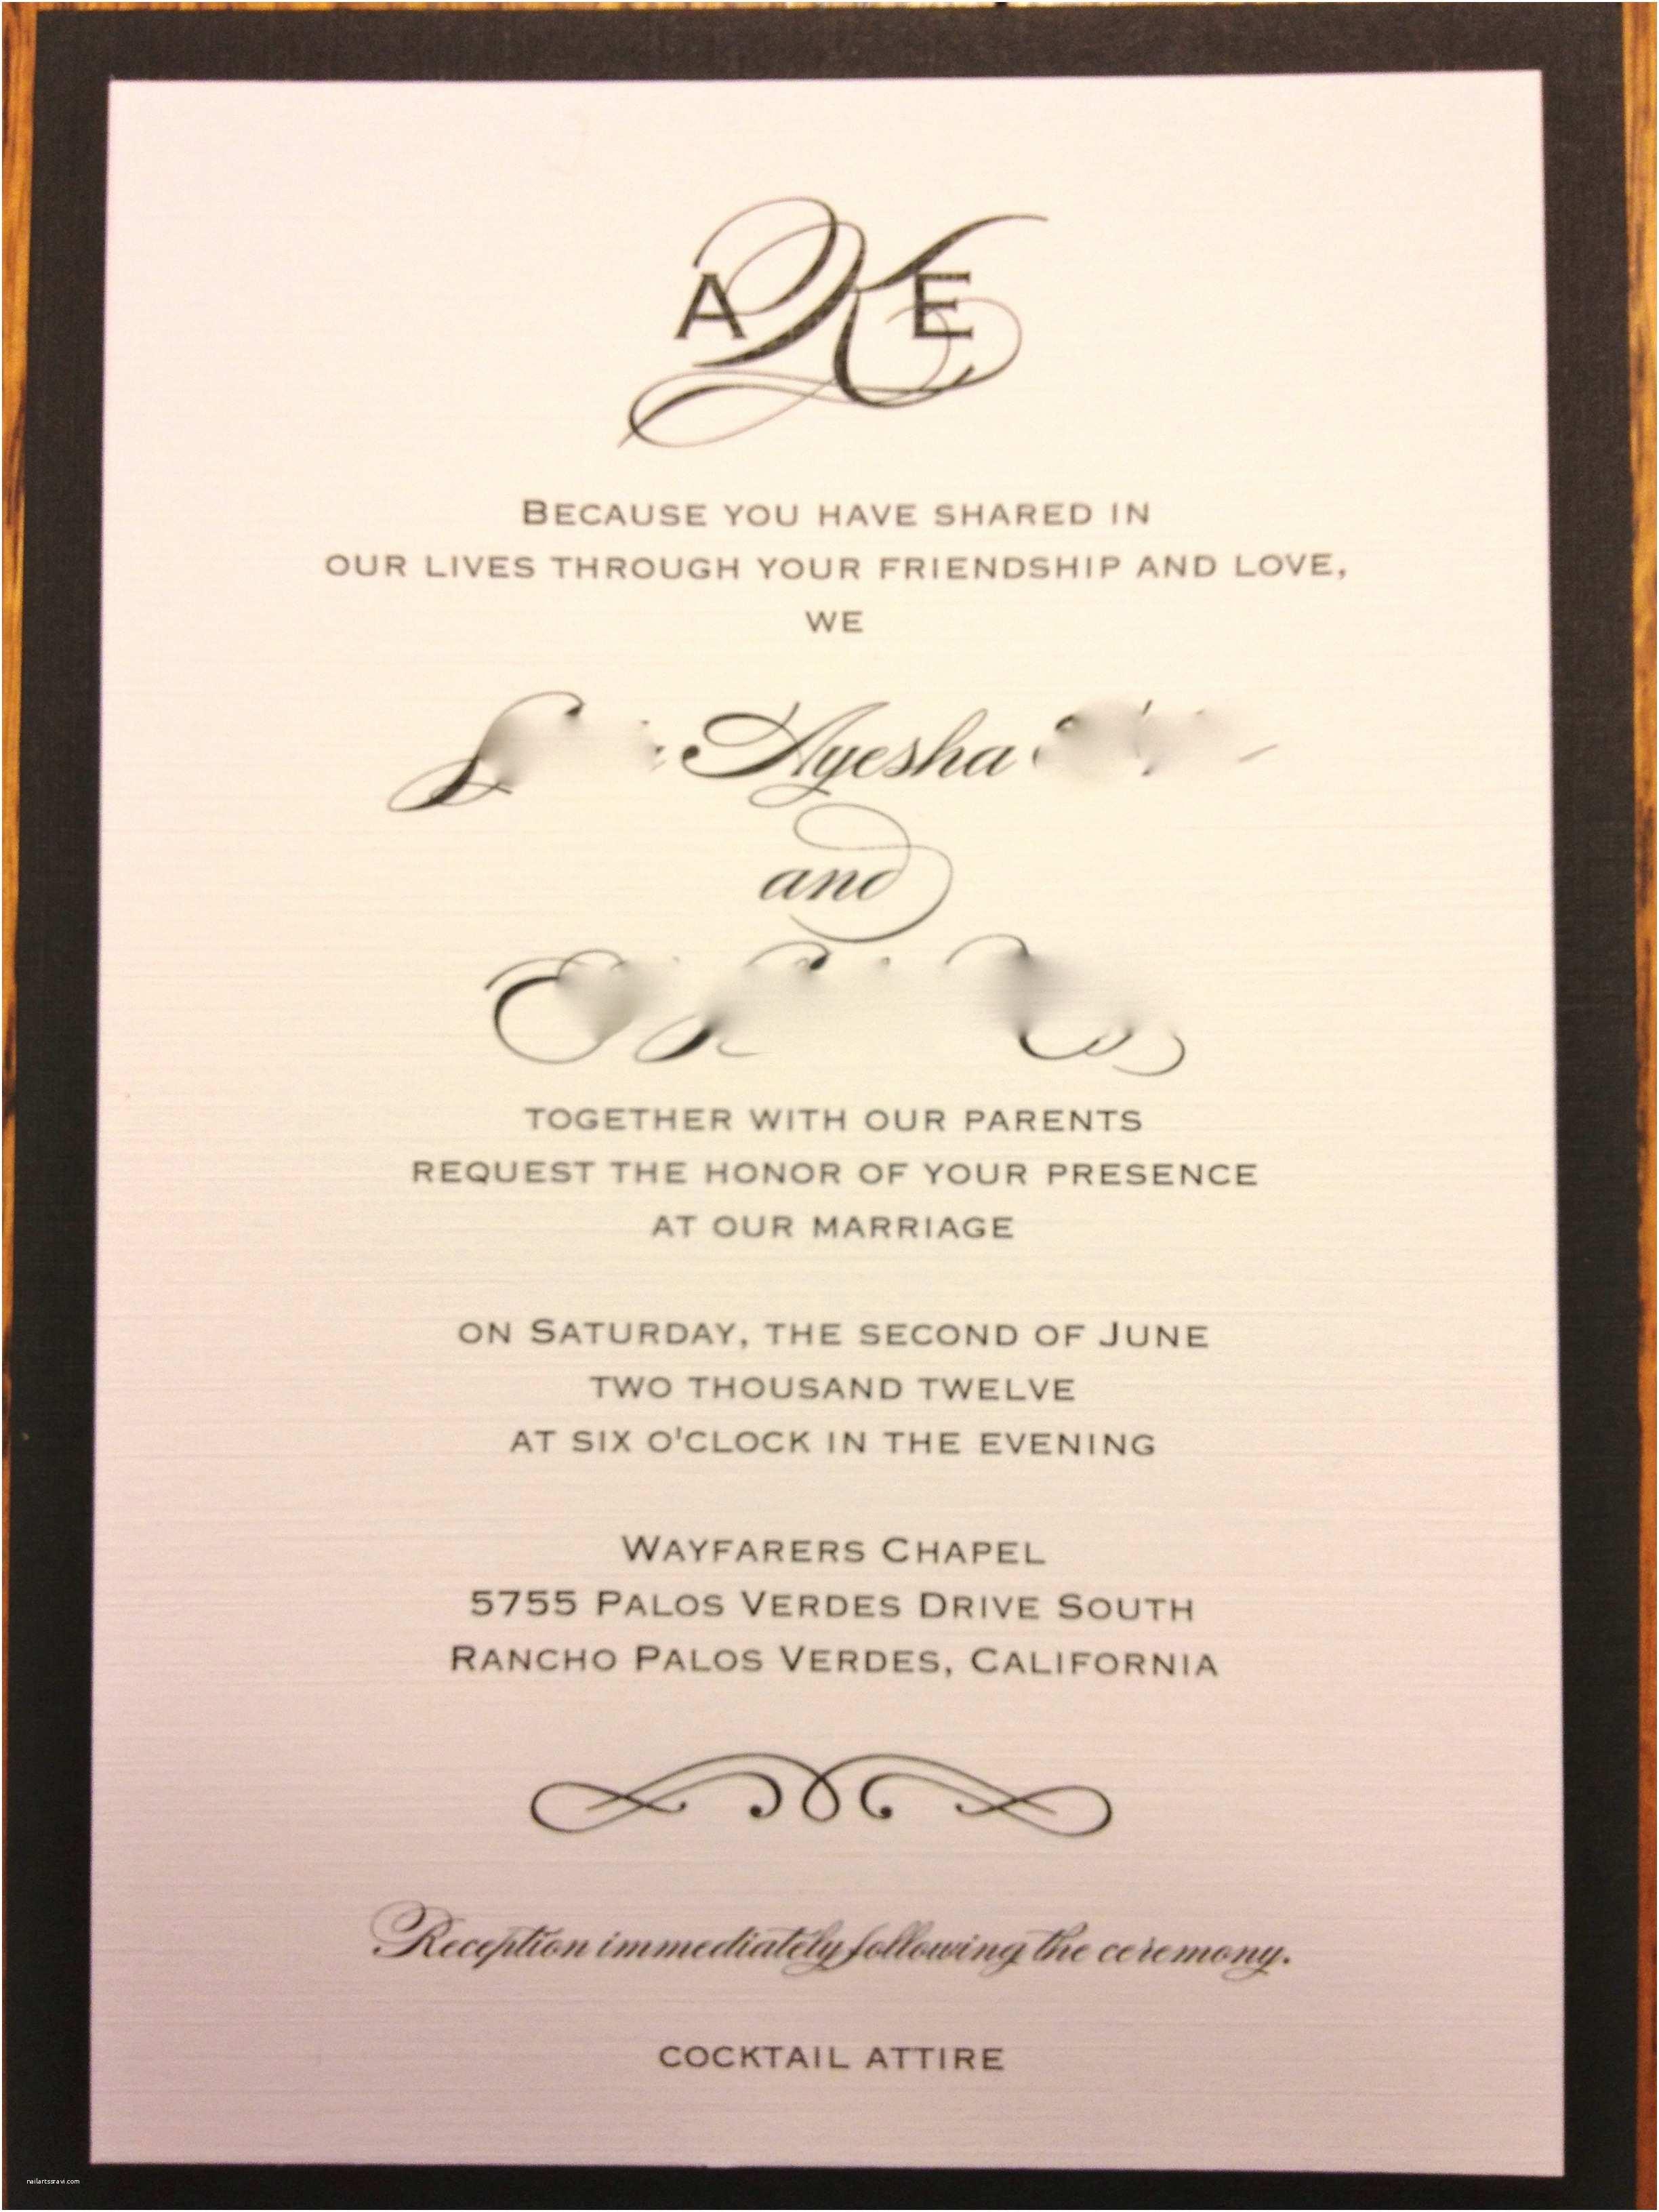 Facebook Wedding Invitation Inspirational Wedding Invitation Wording for Friends In